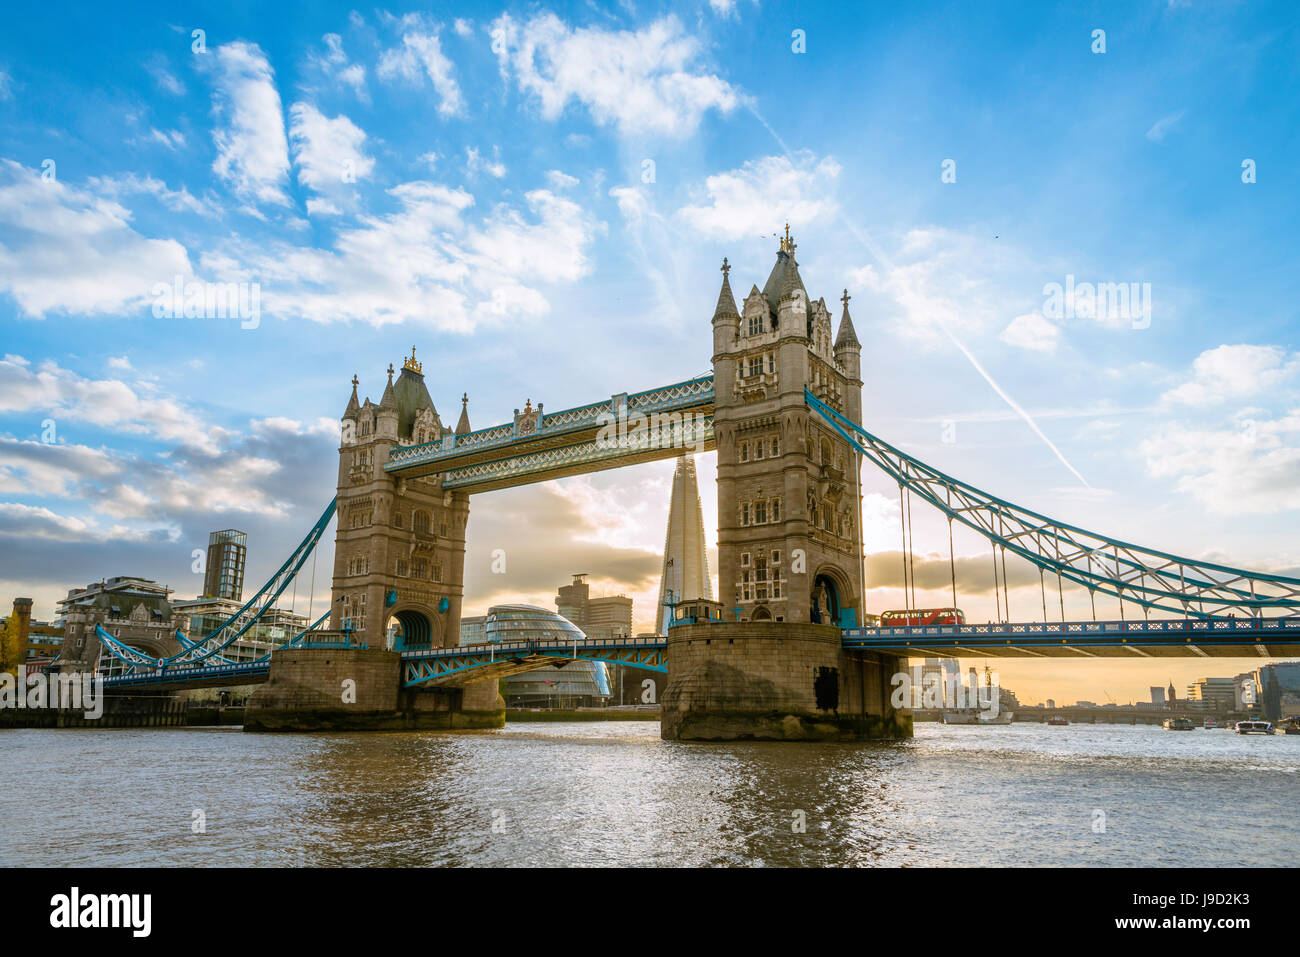 Tower Bridge sobre el río Támesis, Londres, Inglaterra, Reino Unido Imagen De Stock